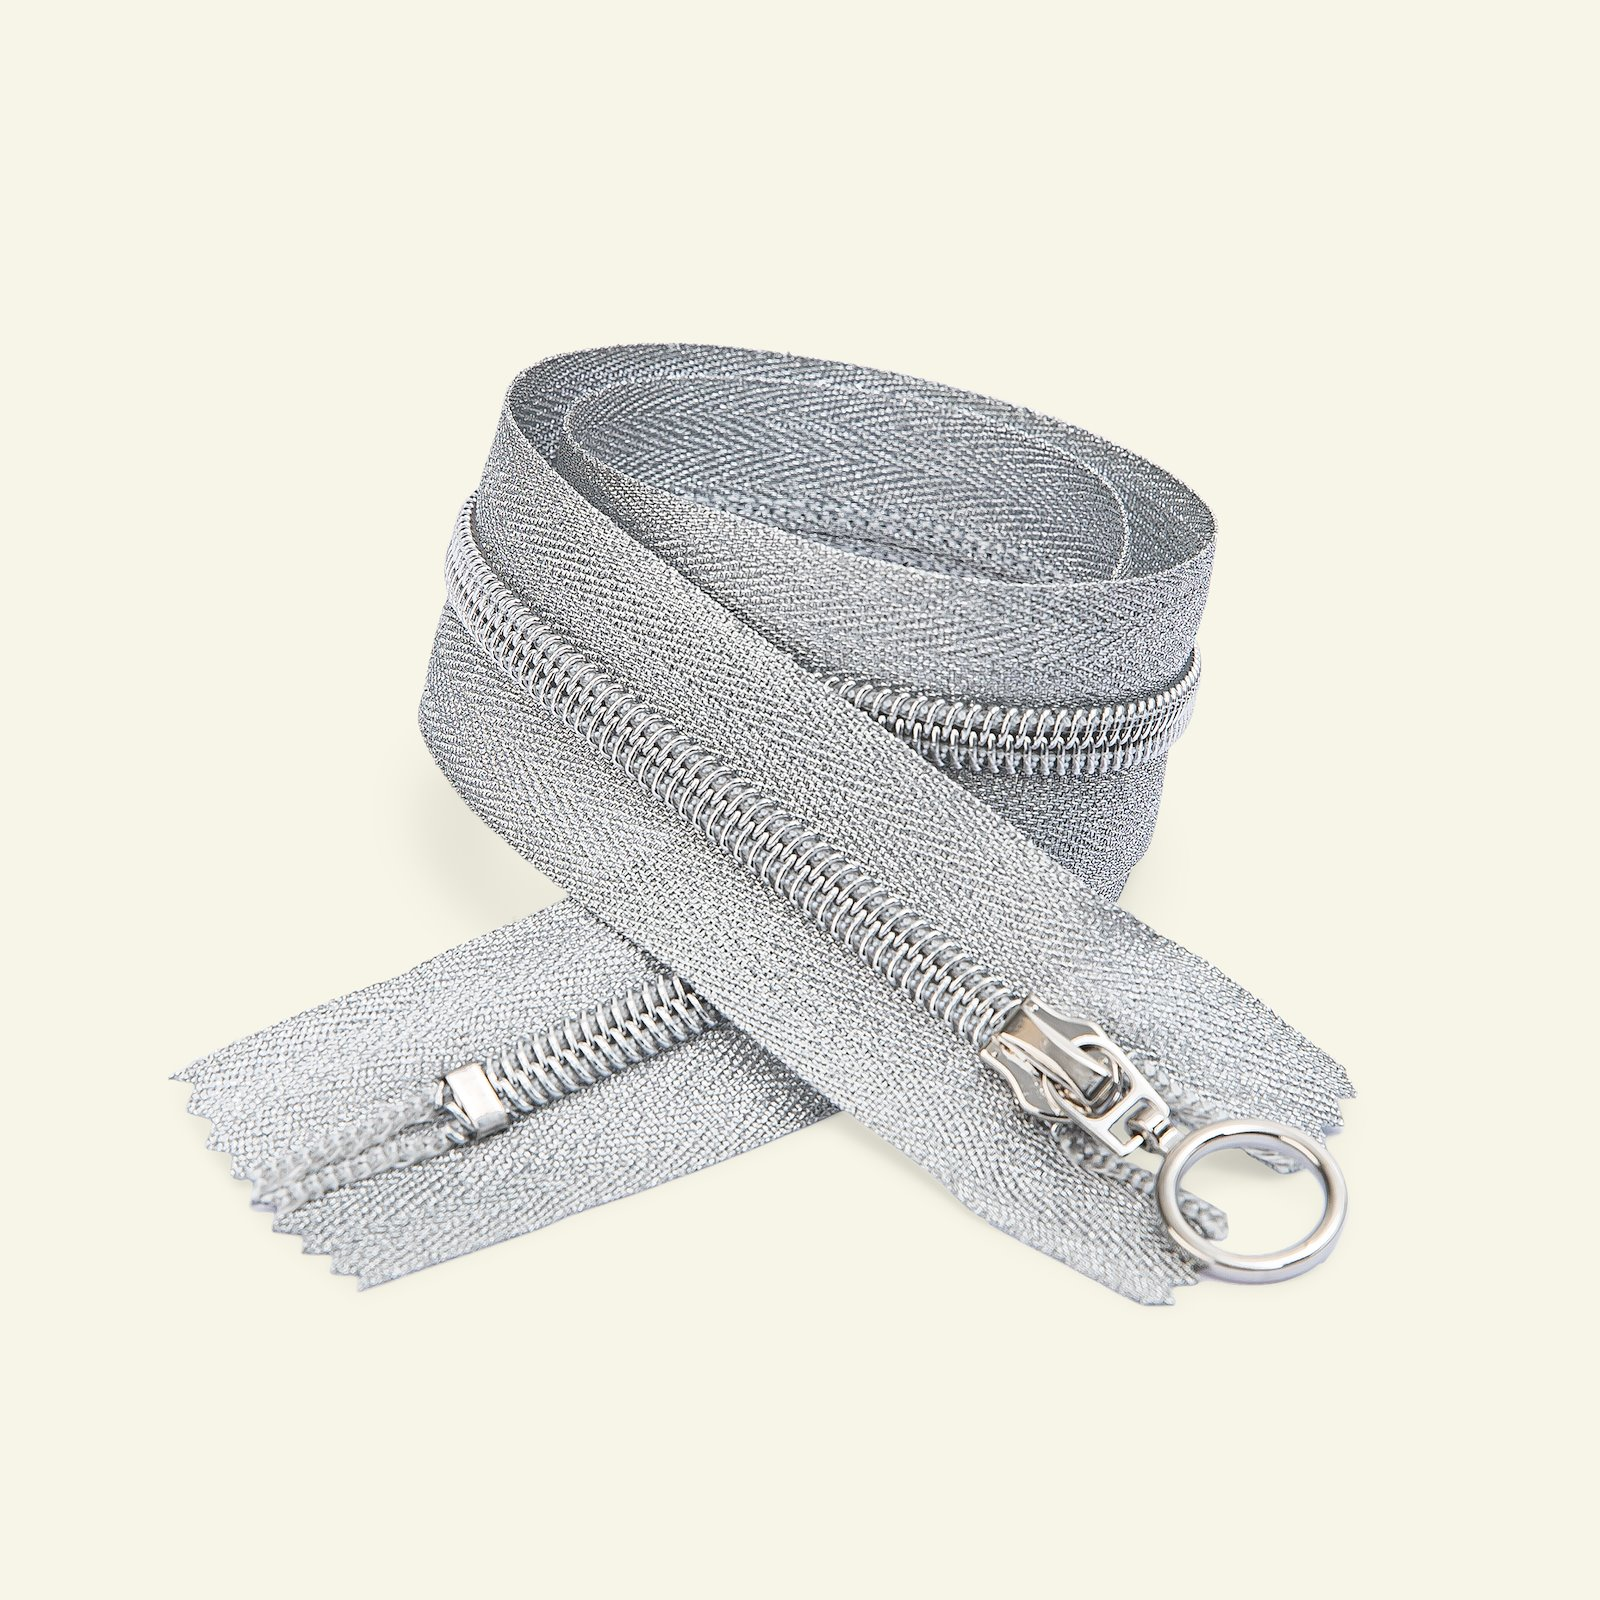 Zip 6mm closed end 40cm silver lurex x48180_pack